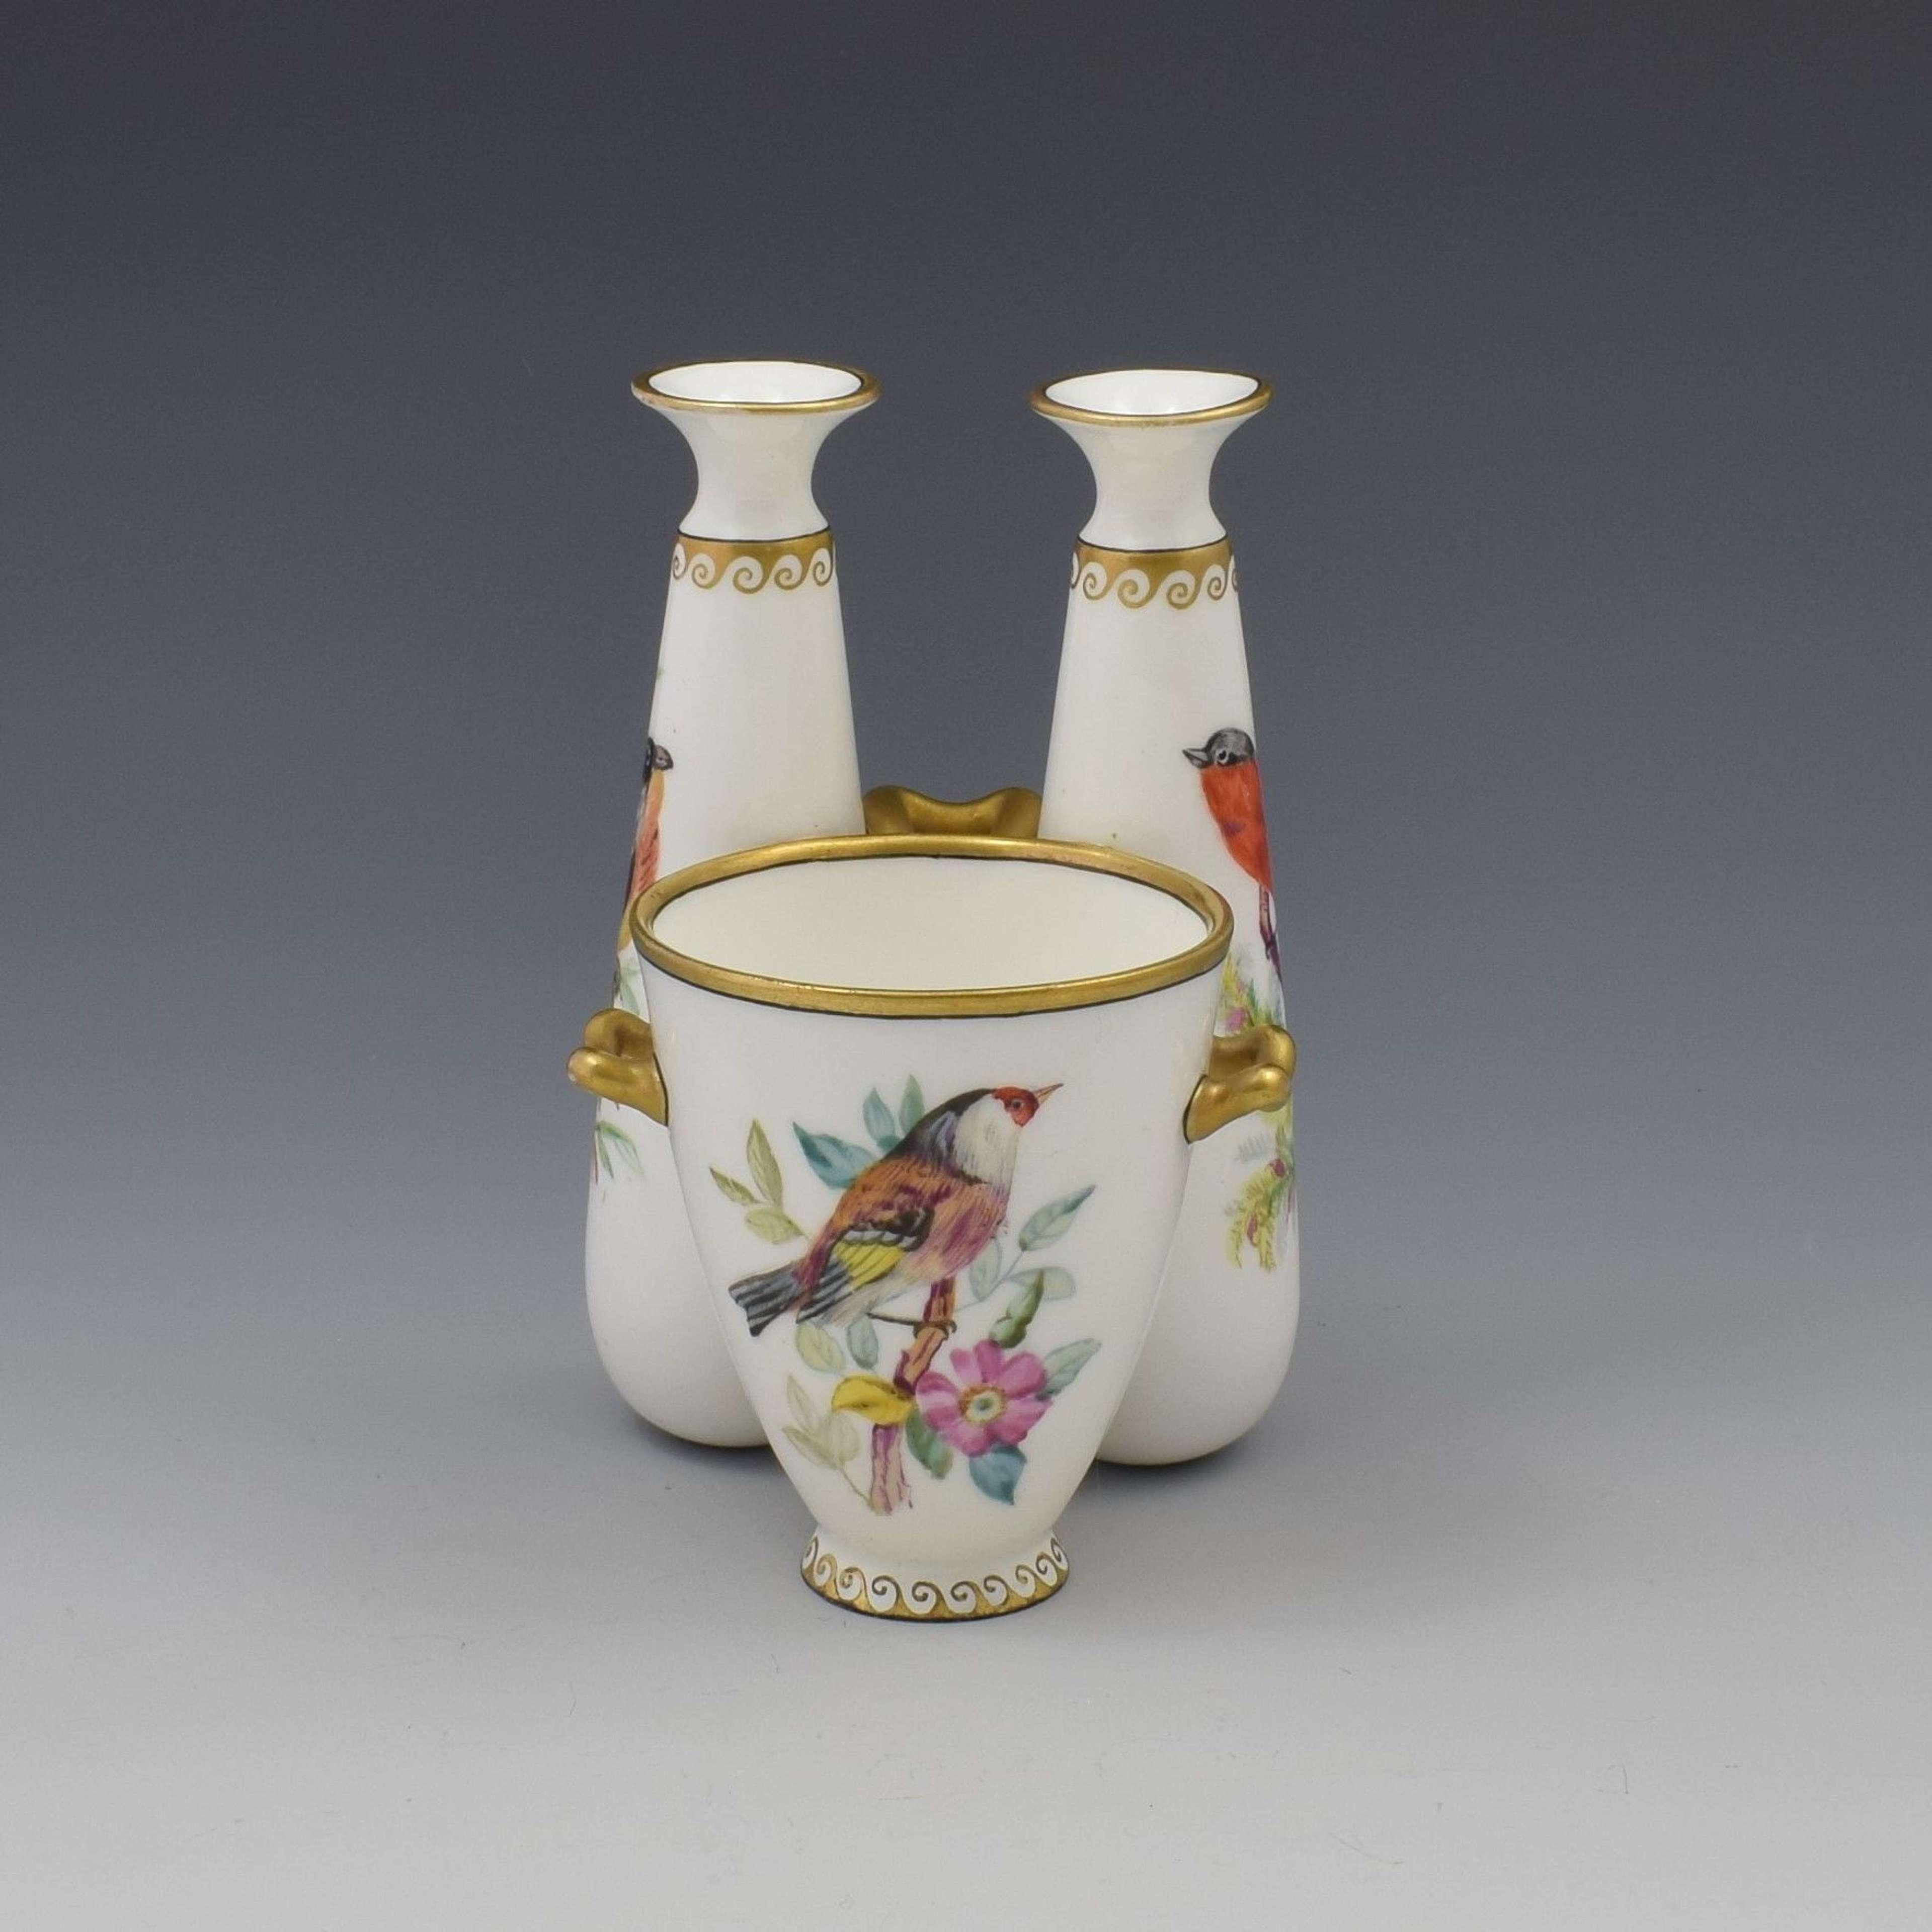 Unusual Royal Worcester Triple 3-In-1 Ornithological Bird Vase